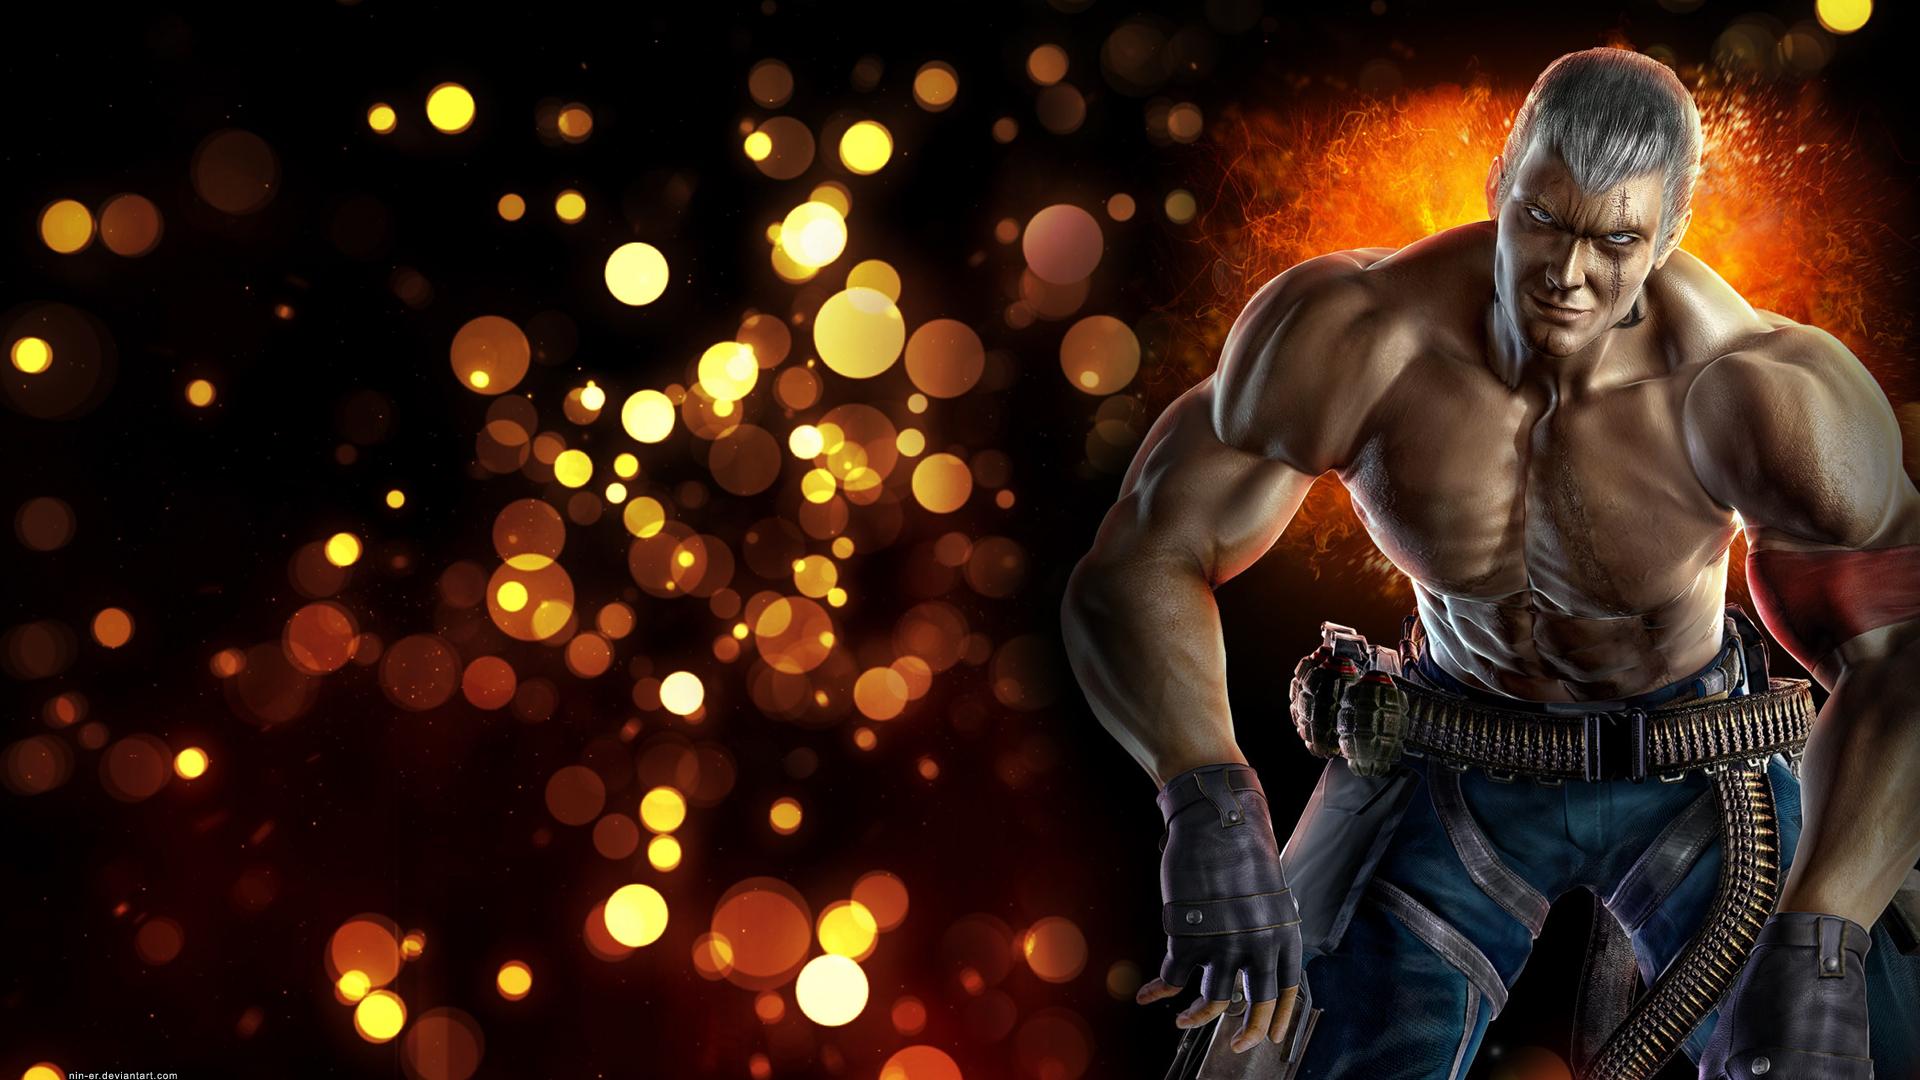 Tekken 6 Hd Wallpaper Background Image 1920x1080 Id 668157